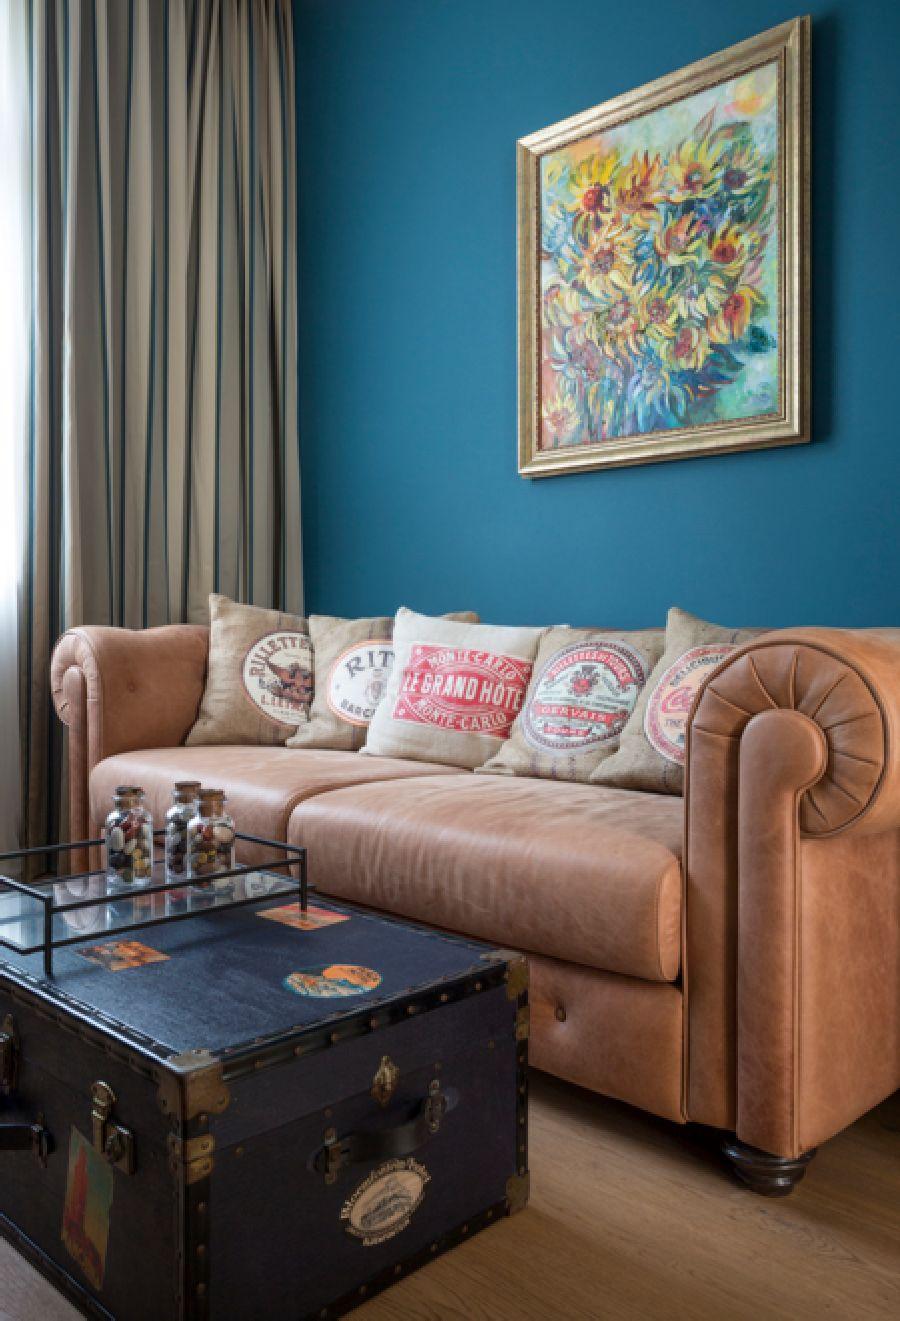 adelaparvu.com despre apartament de 80 mp patrati cu aer rustic elegant, locuinta Rusia, designer Zhenya Zhdanova (19)